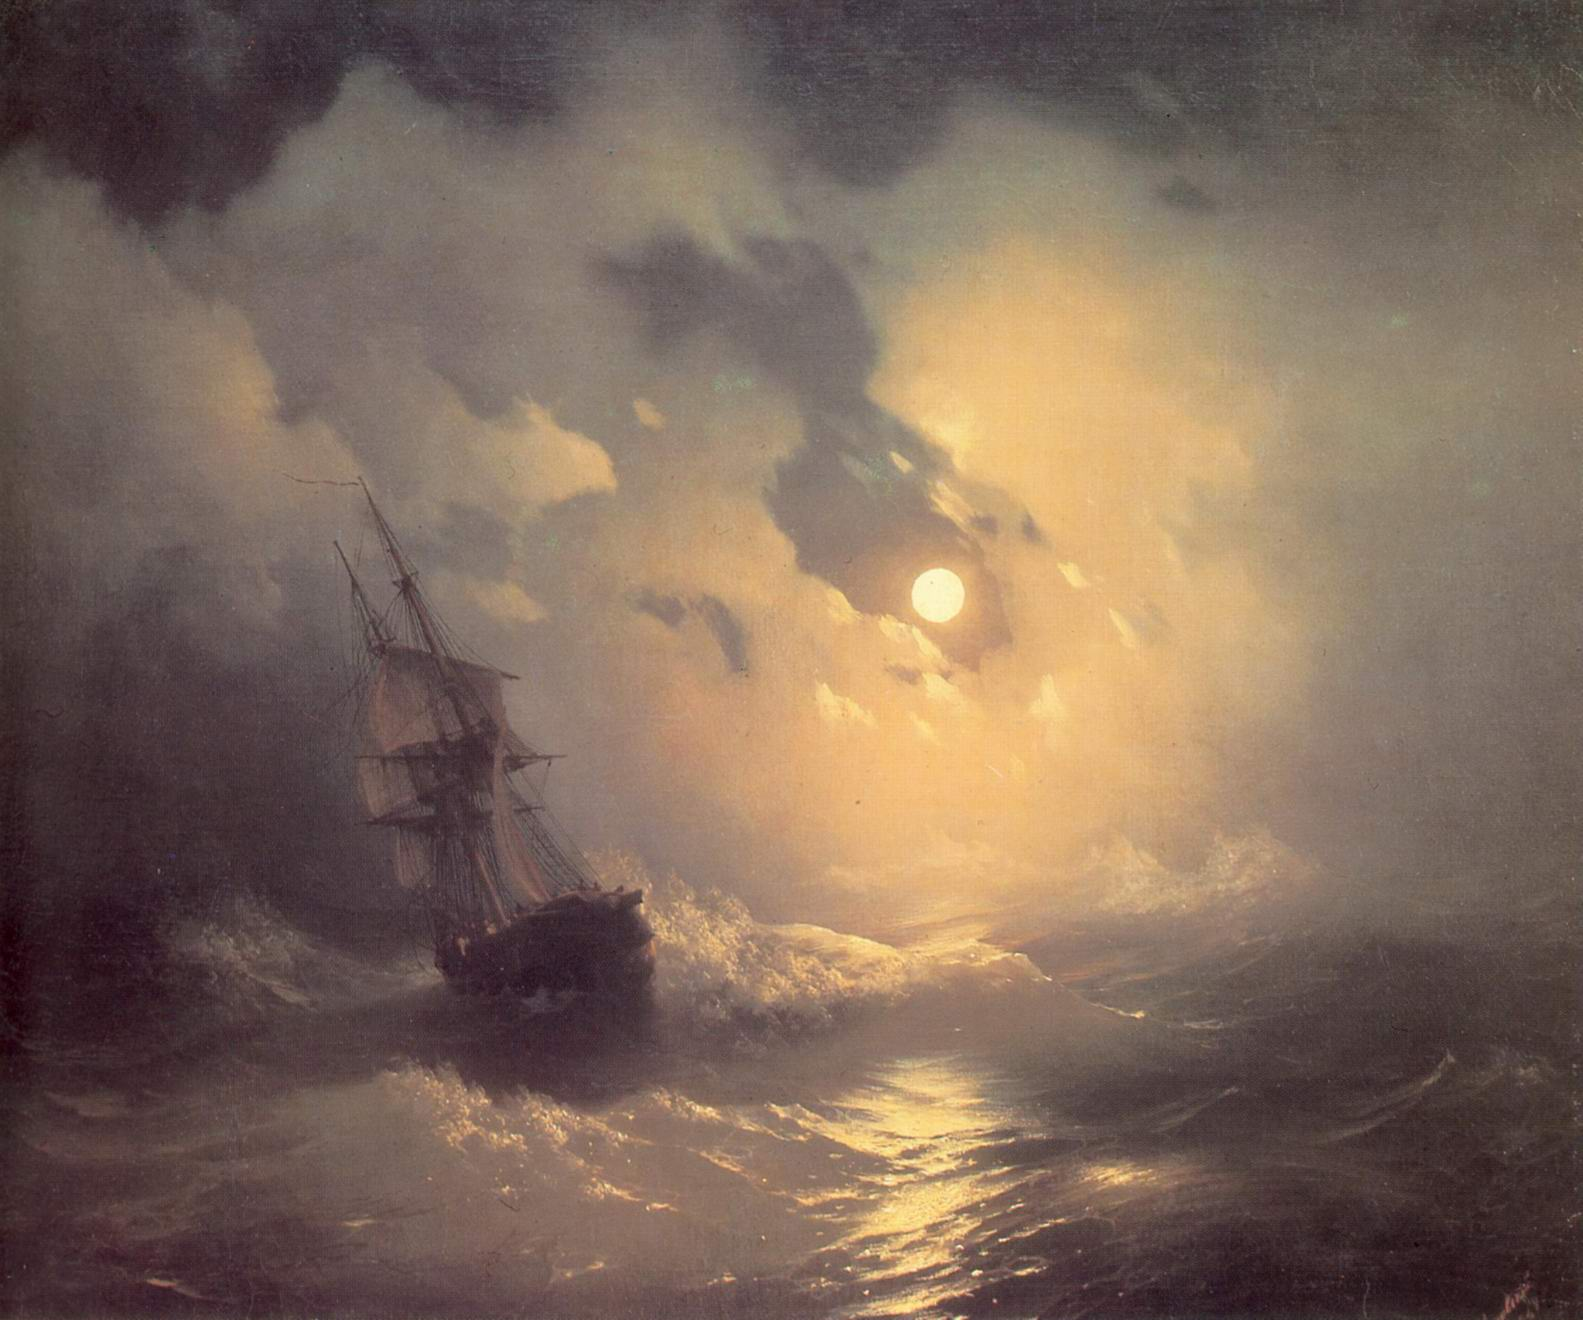 Буря на море ночью, Айвазовский Иван Константинович